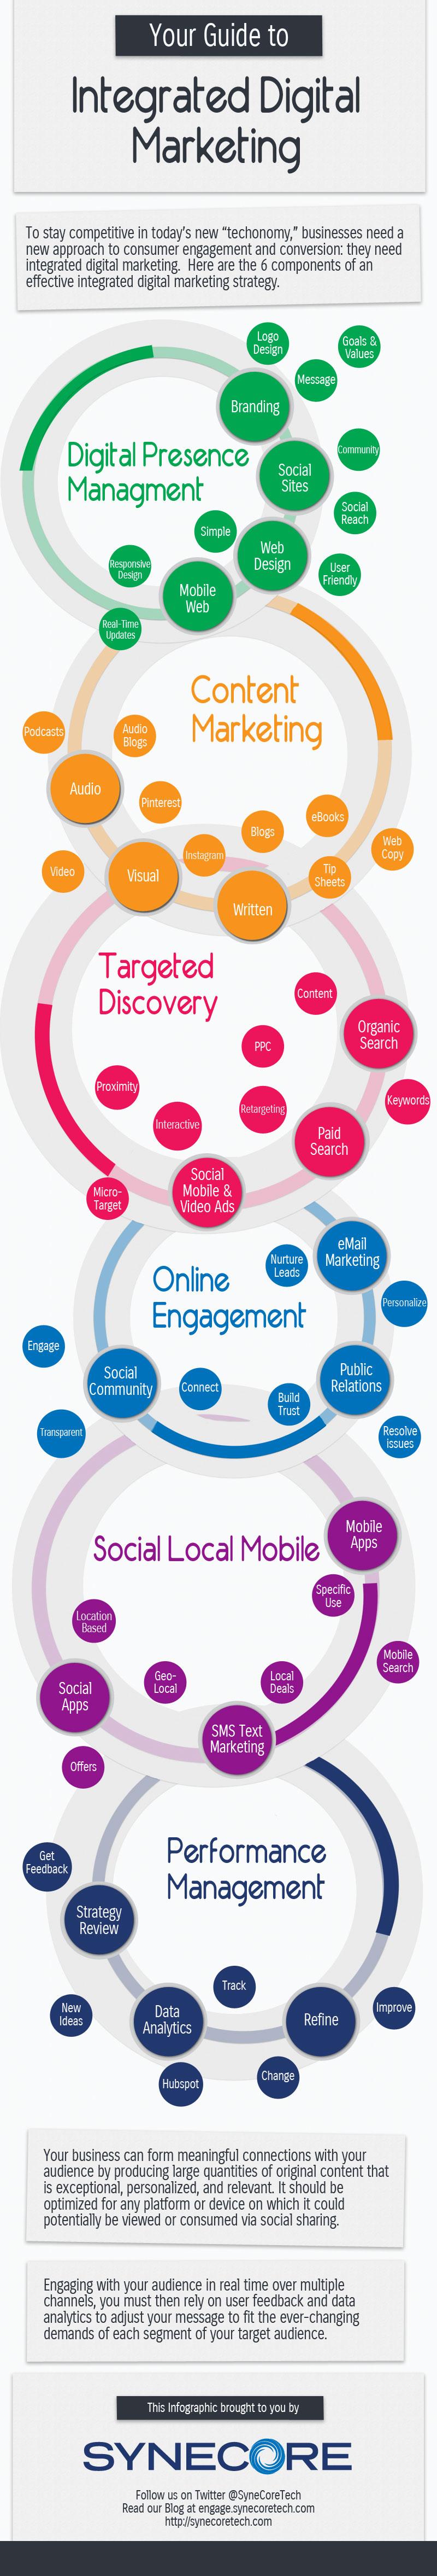 Digital Marketing Overview INFOGRAPHiCs MANiA